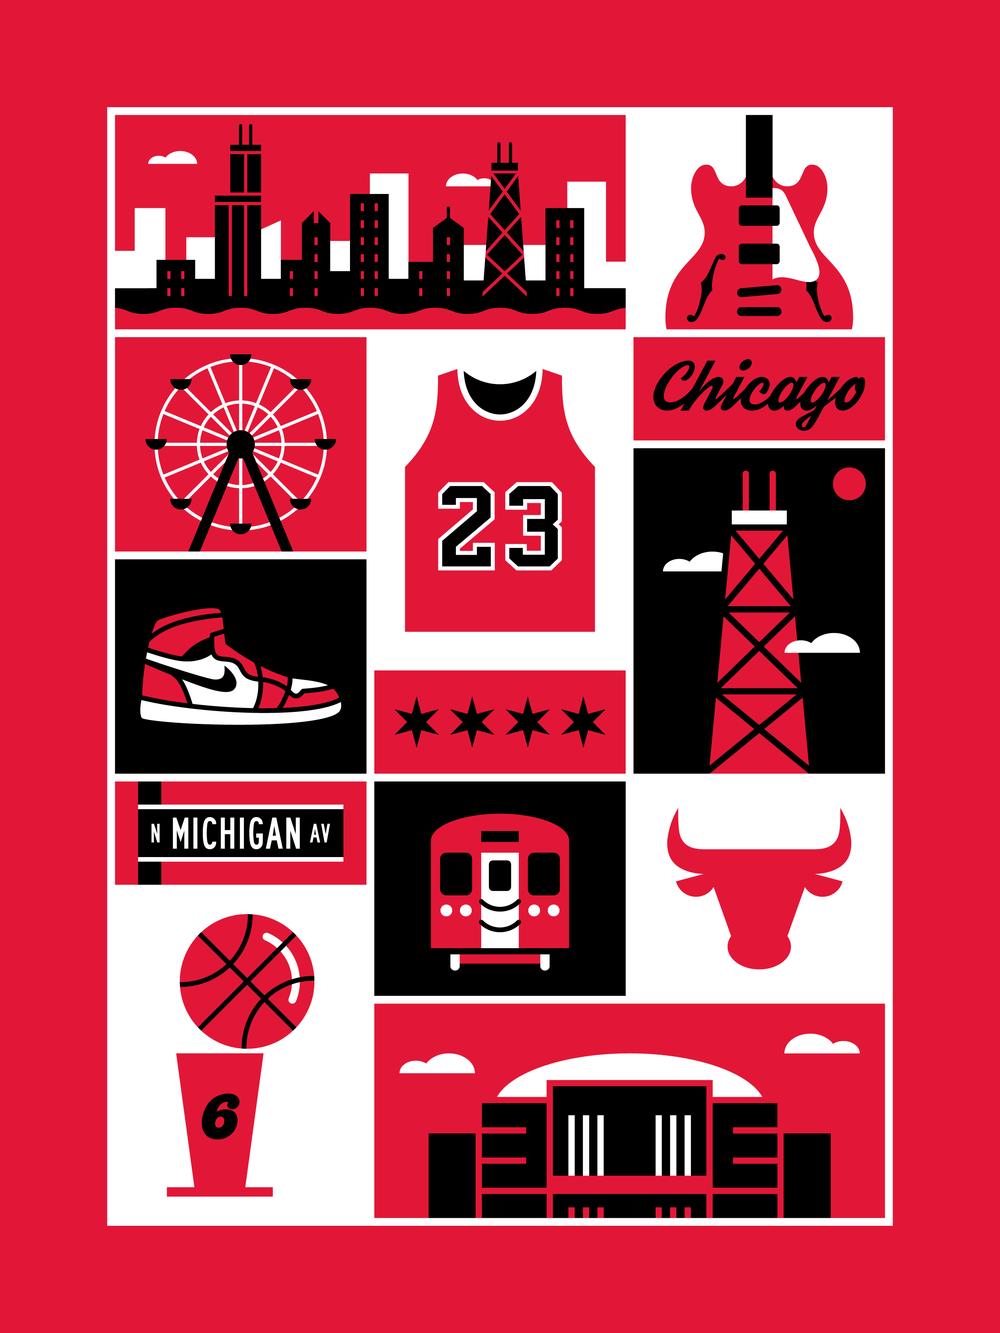 chicago-basketball-elias-stein.png